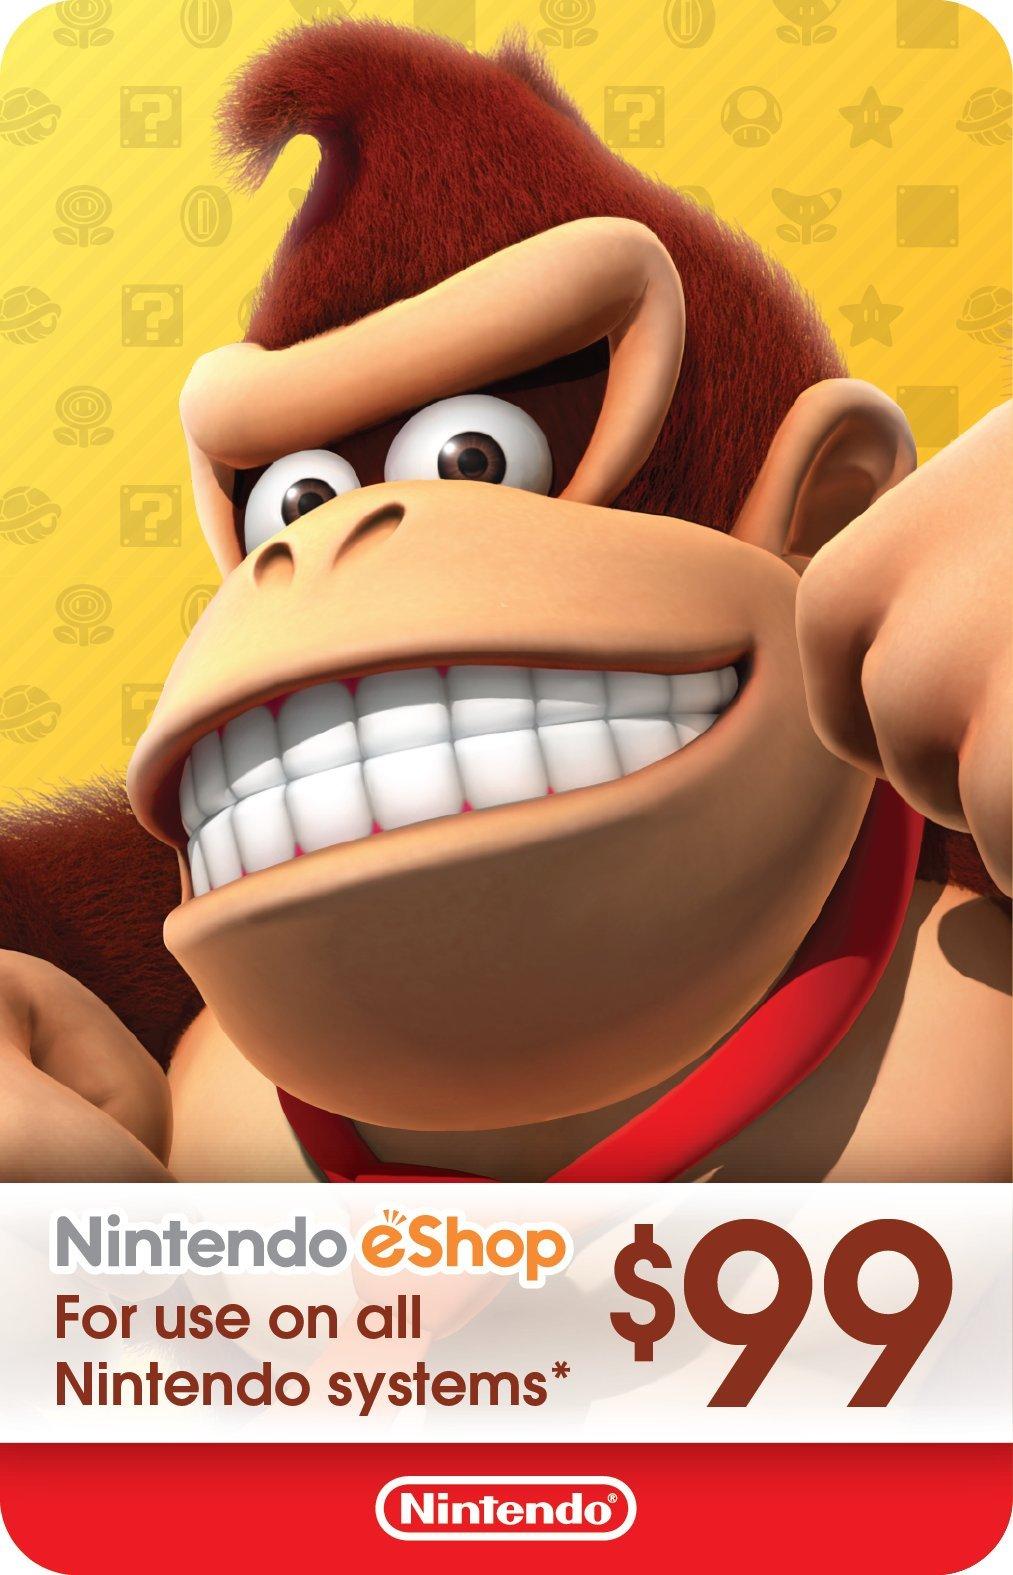 $99 Nintendo eShop Gift Card [Digital Code] by Nintendo